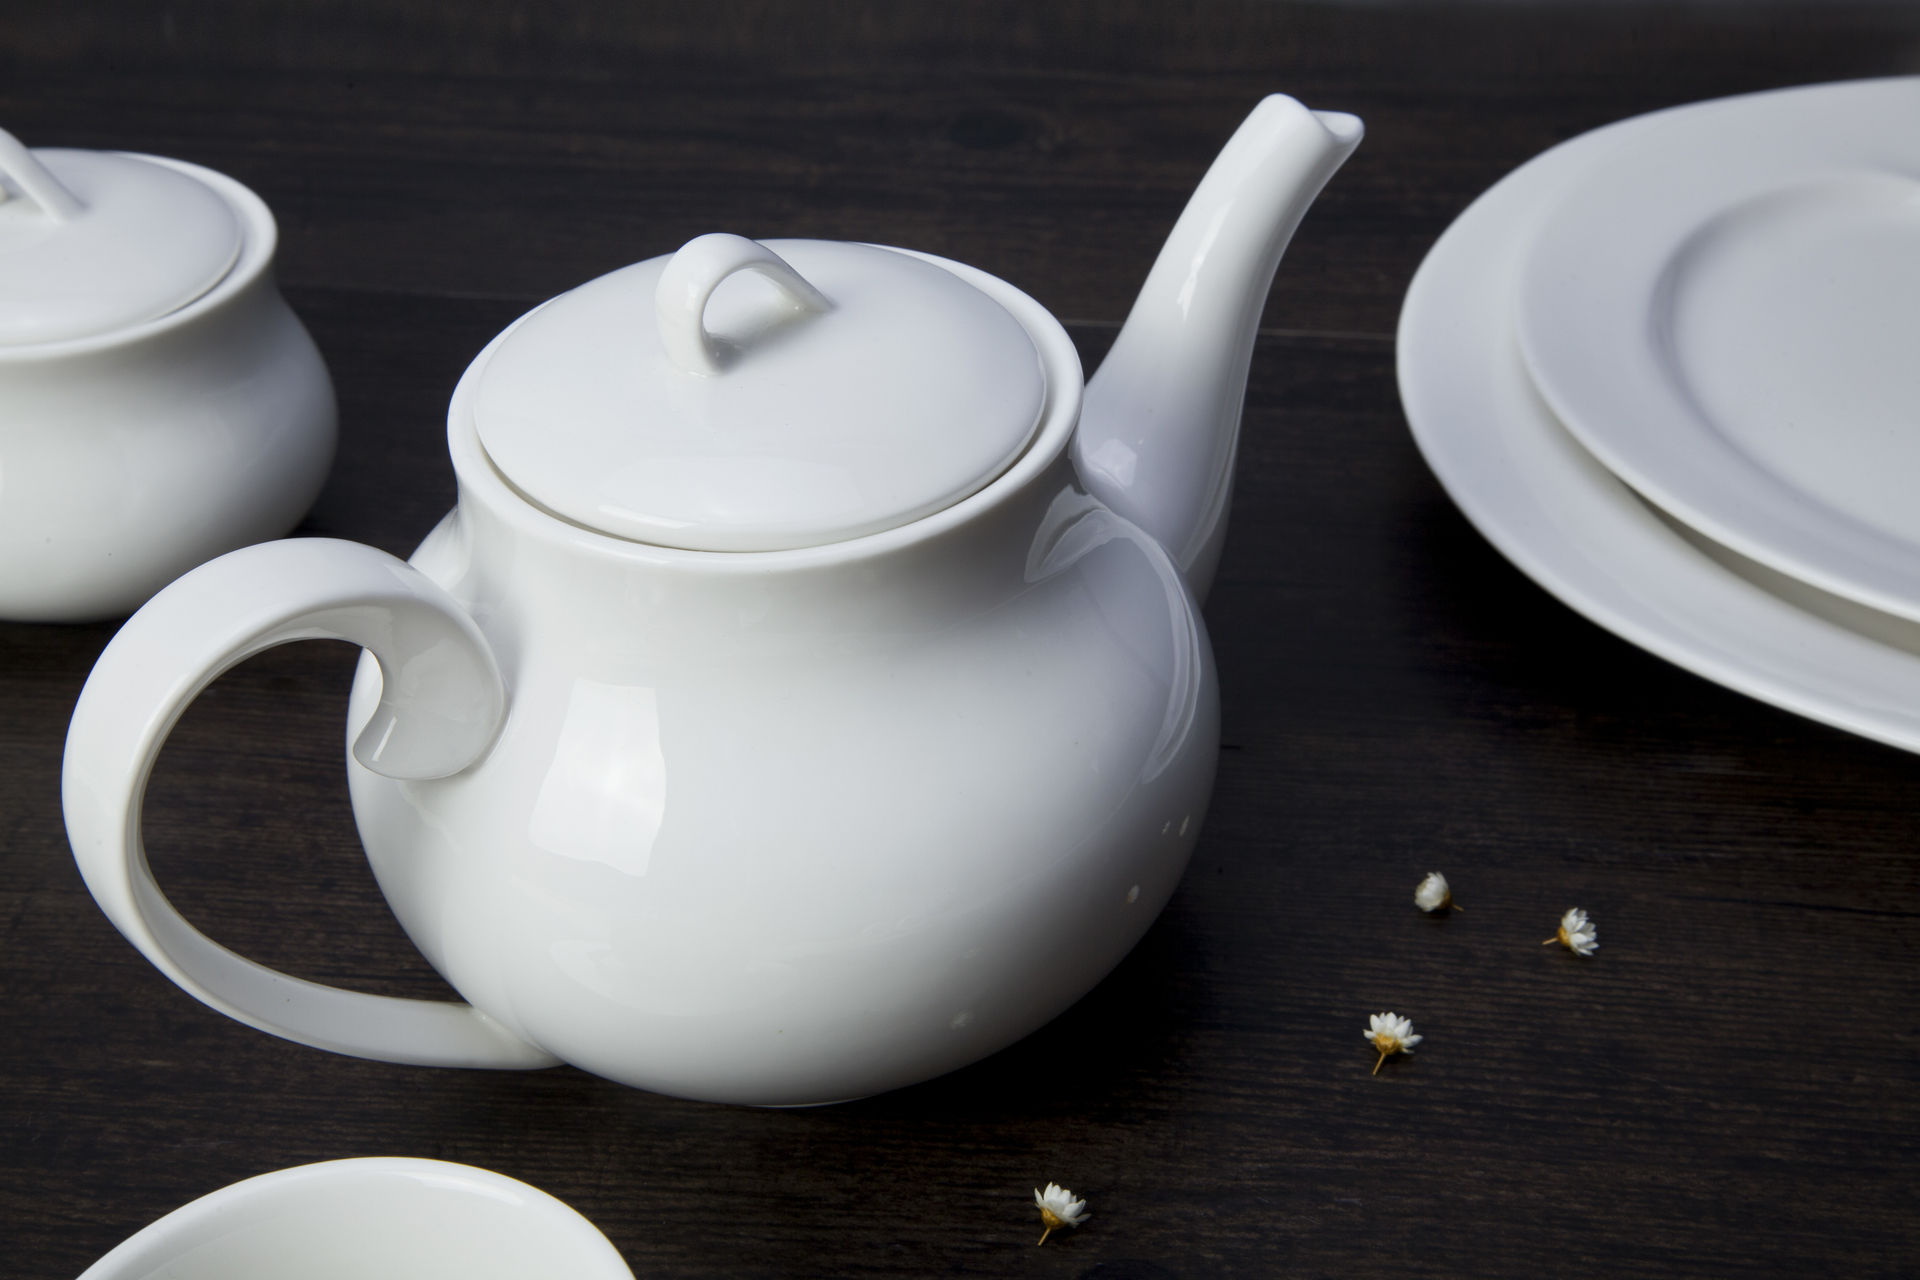 Ceramic dish set dinner plate tableware factory hot selling best price easy cleaning Restaurant white porcelain diner set